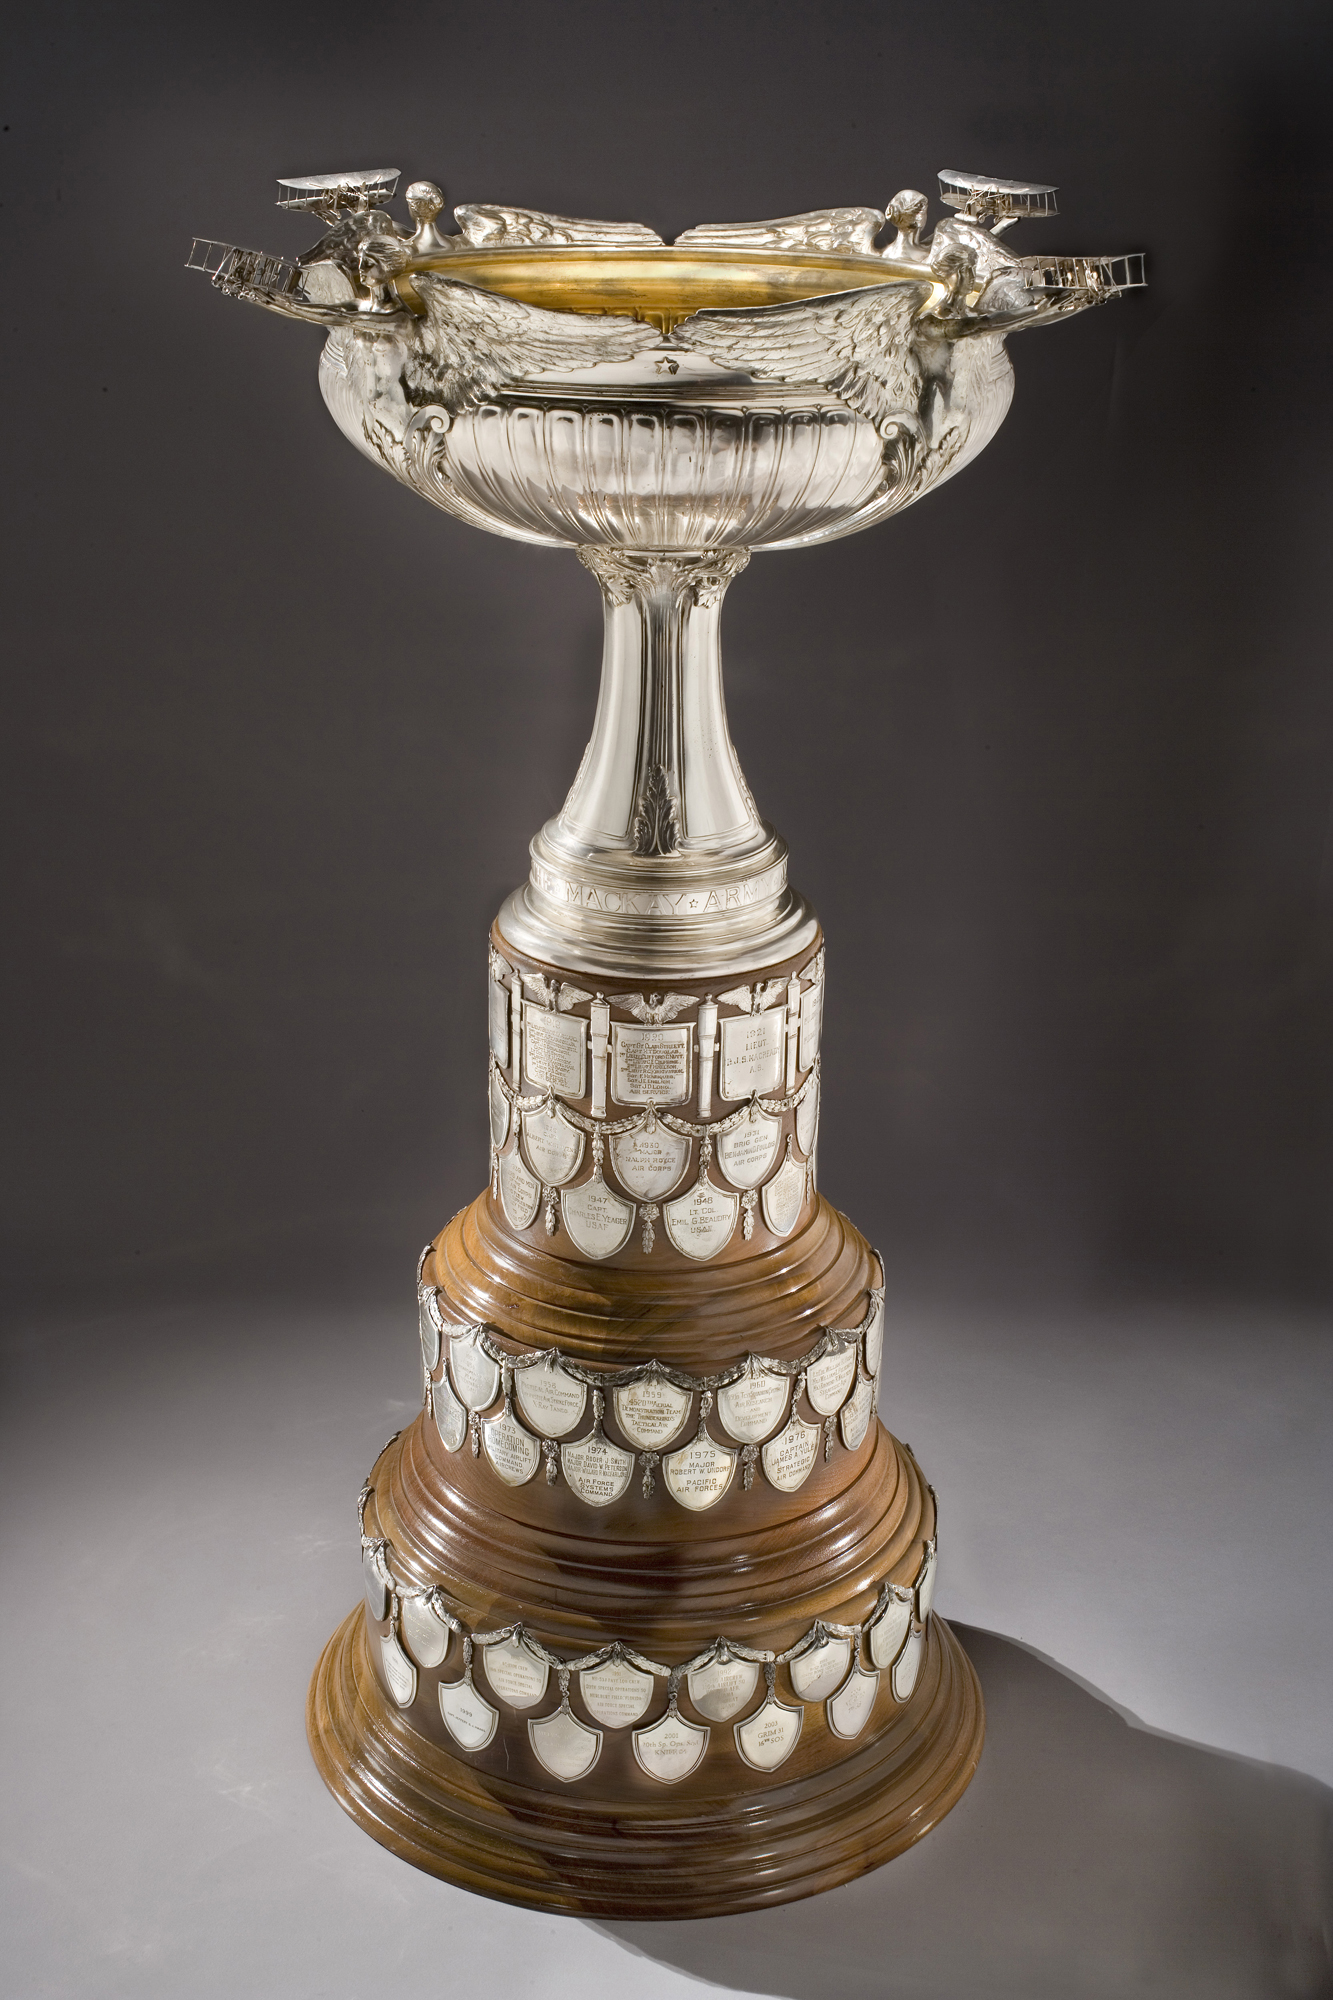 The Mackay Trophy